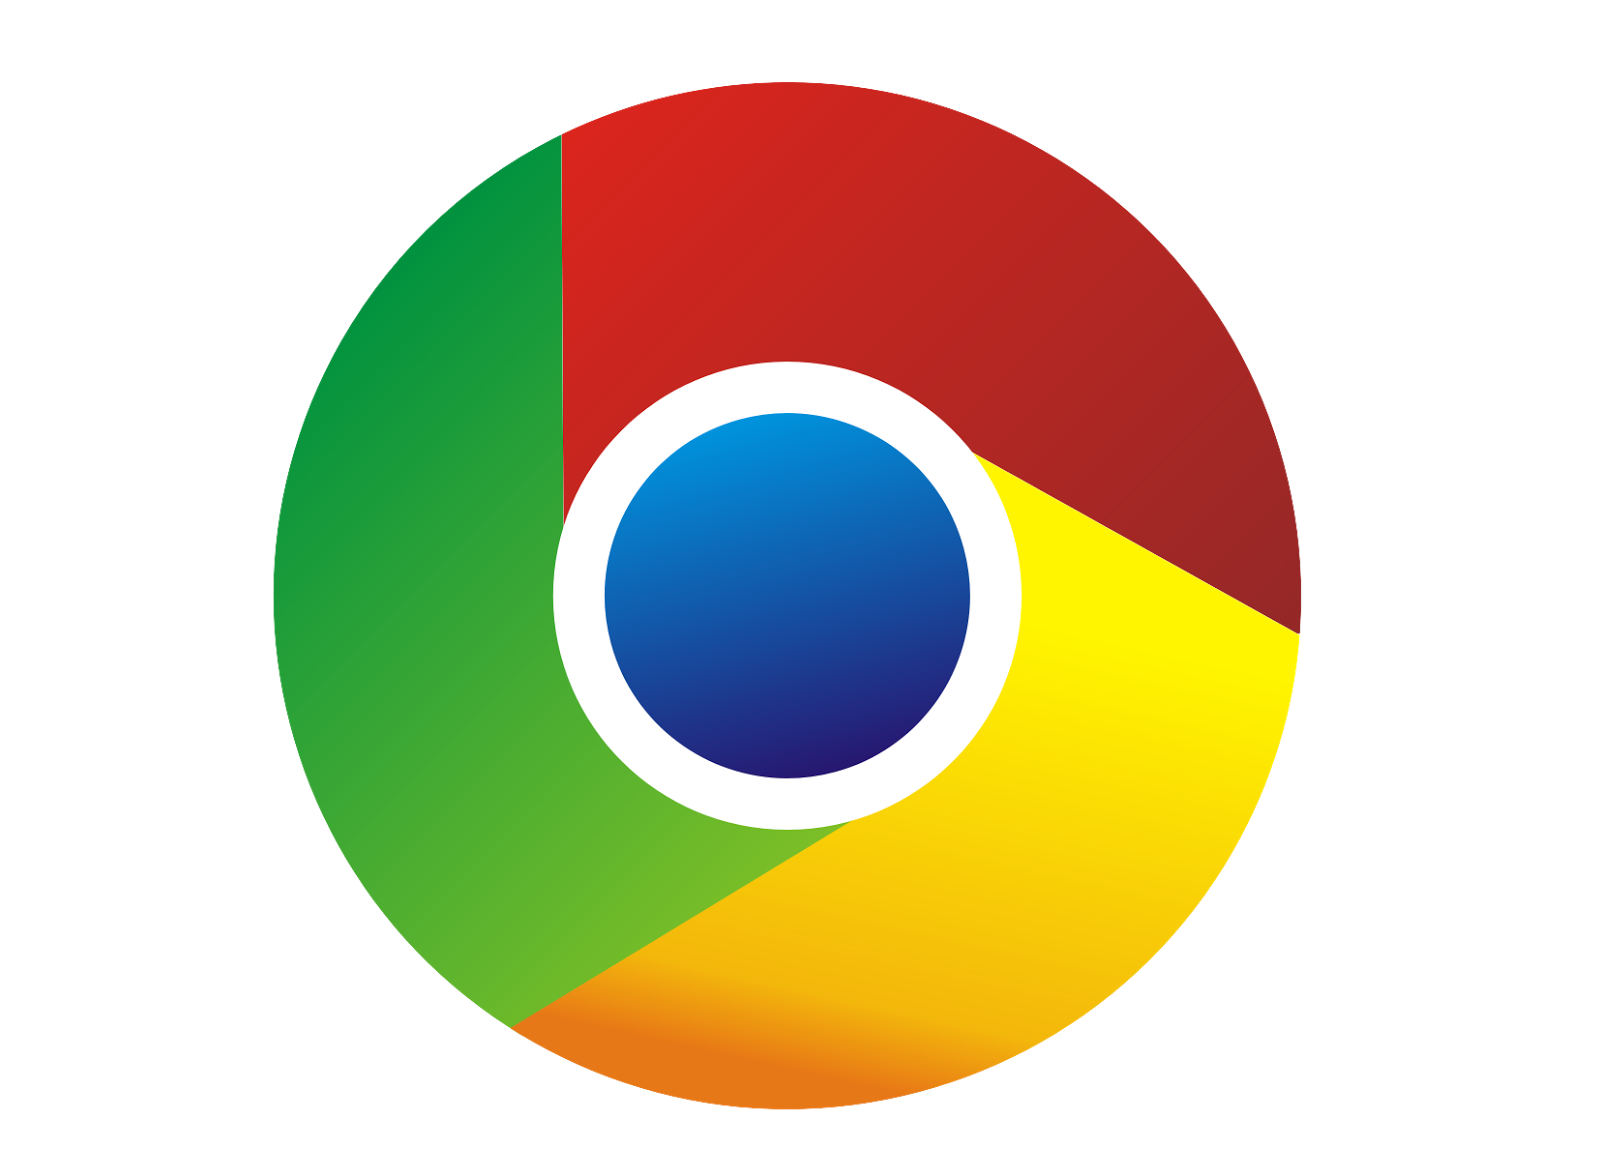 Google Chrome Logo Vector PNG - 104258